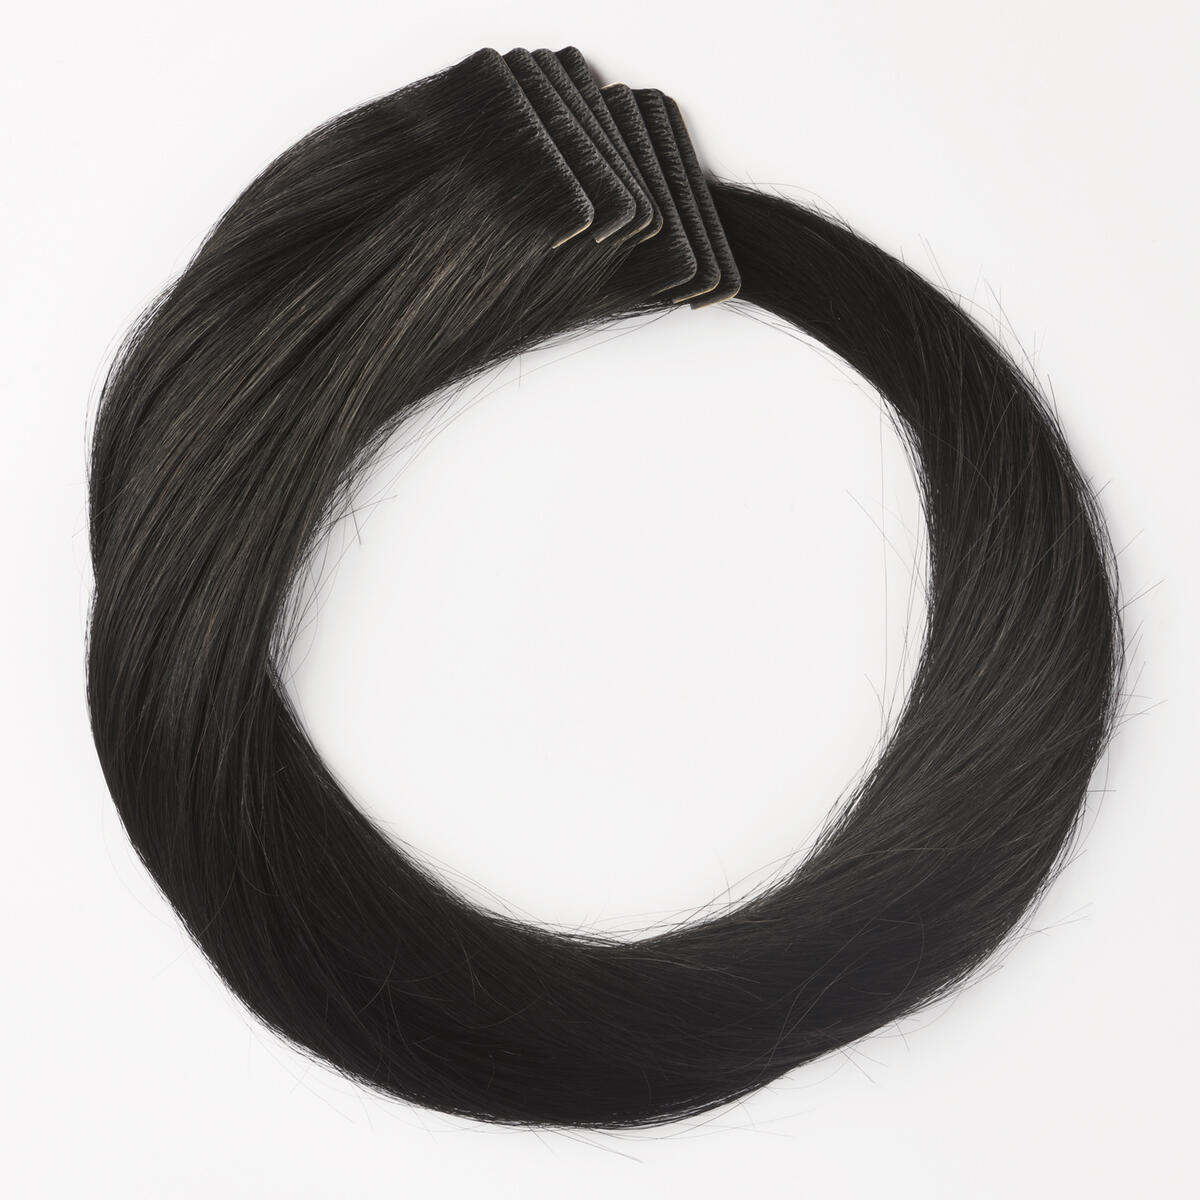 Pro Tape Extension 1.0 Black 50 cm